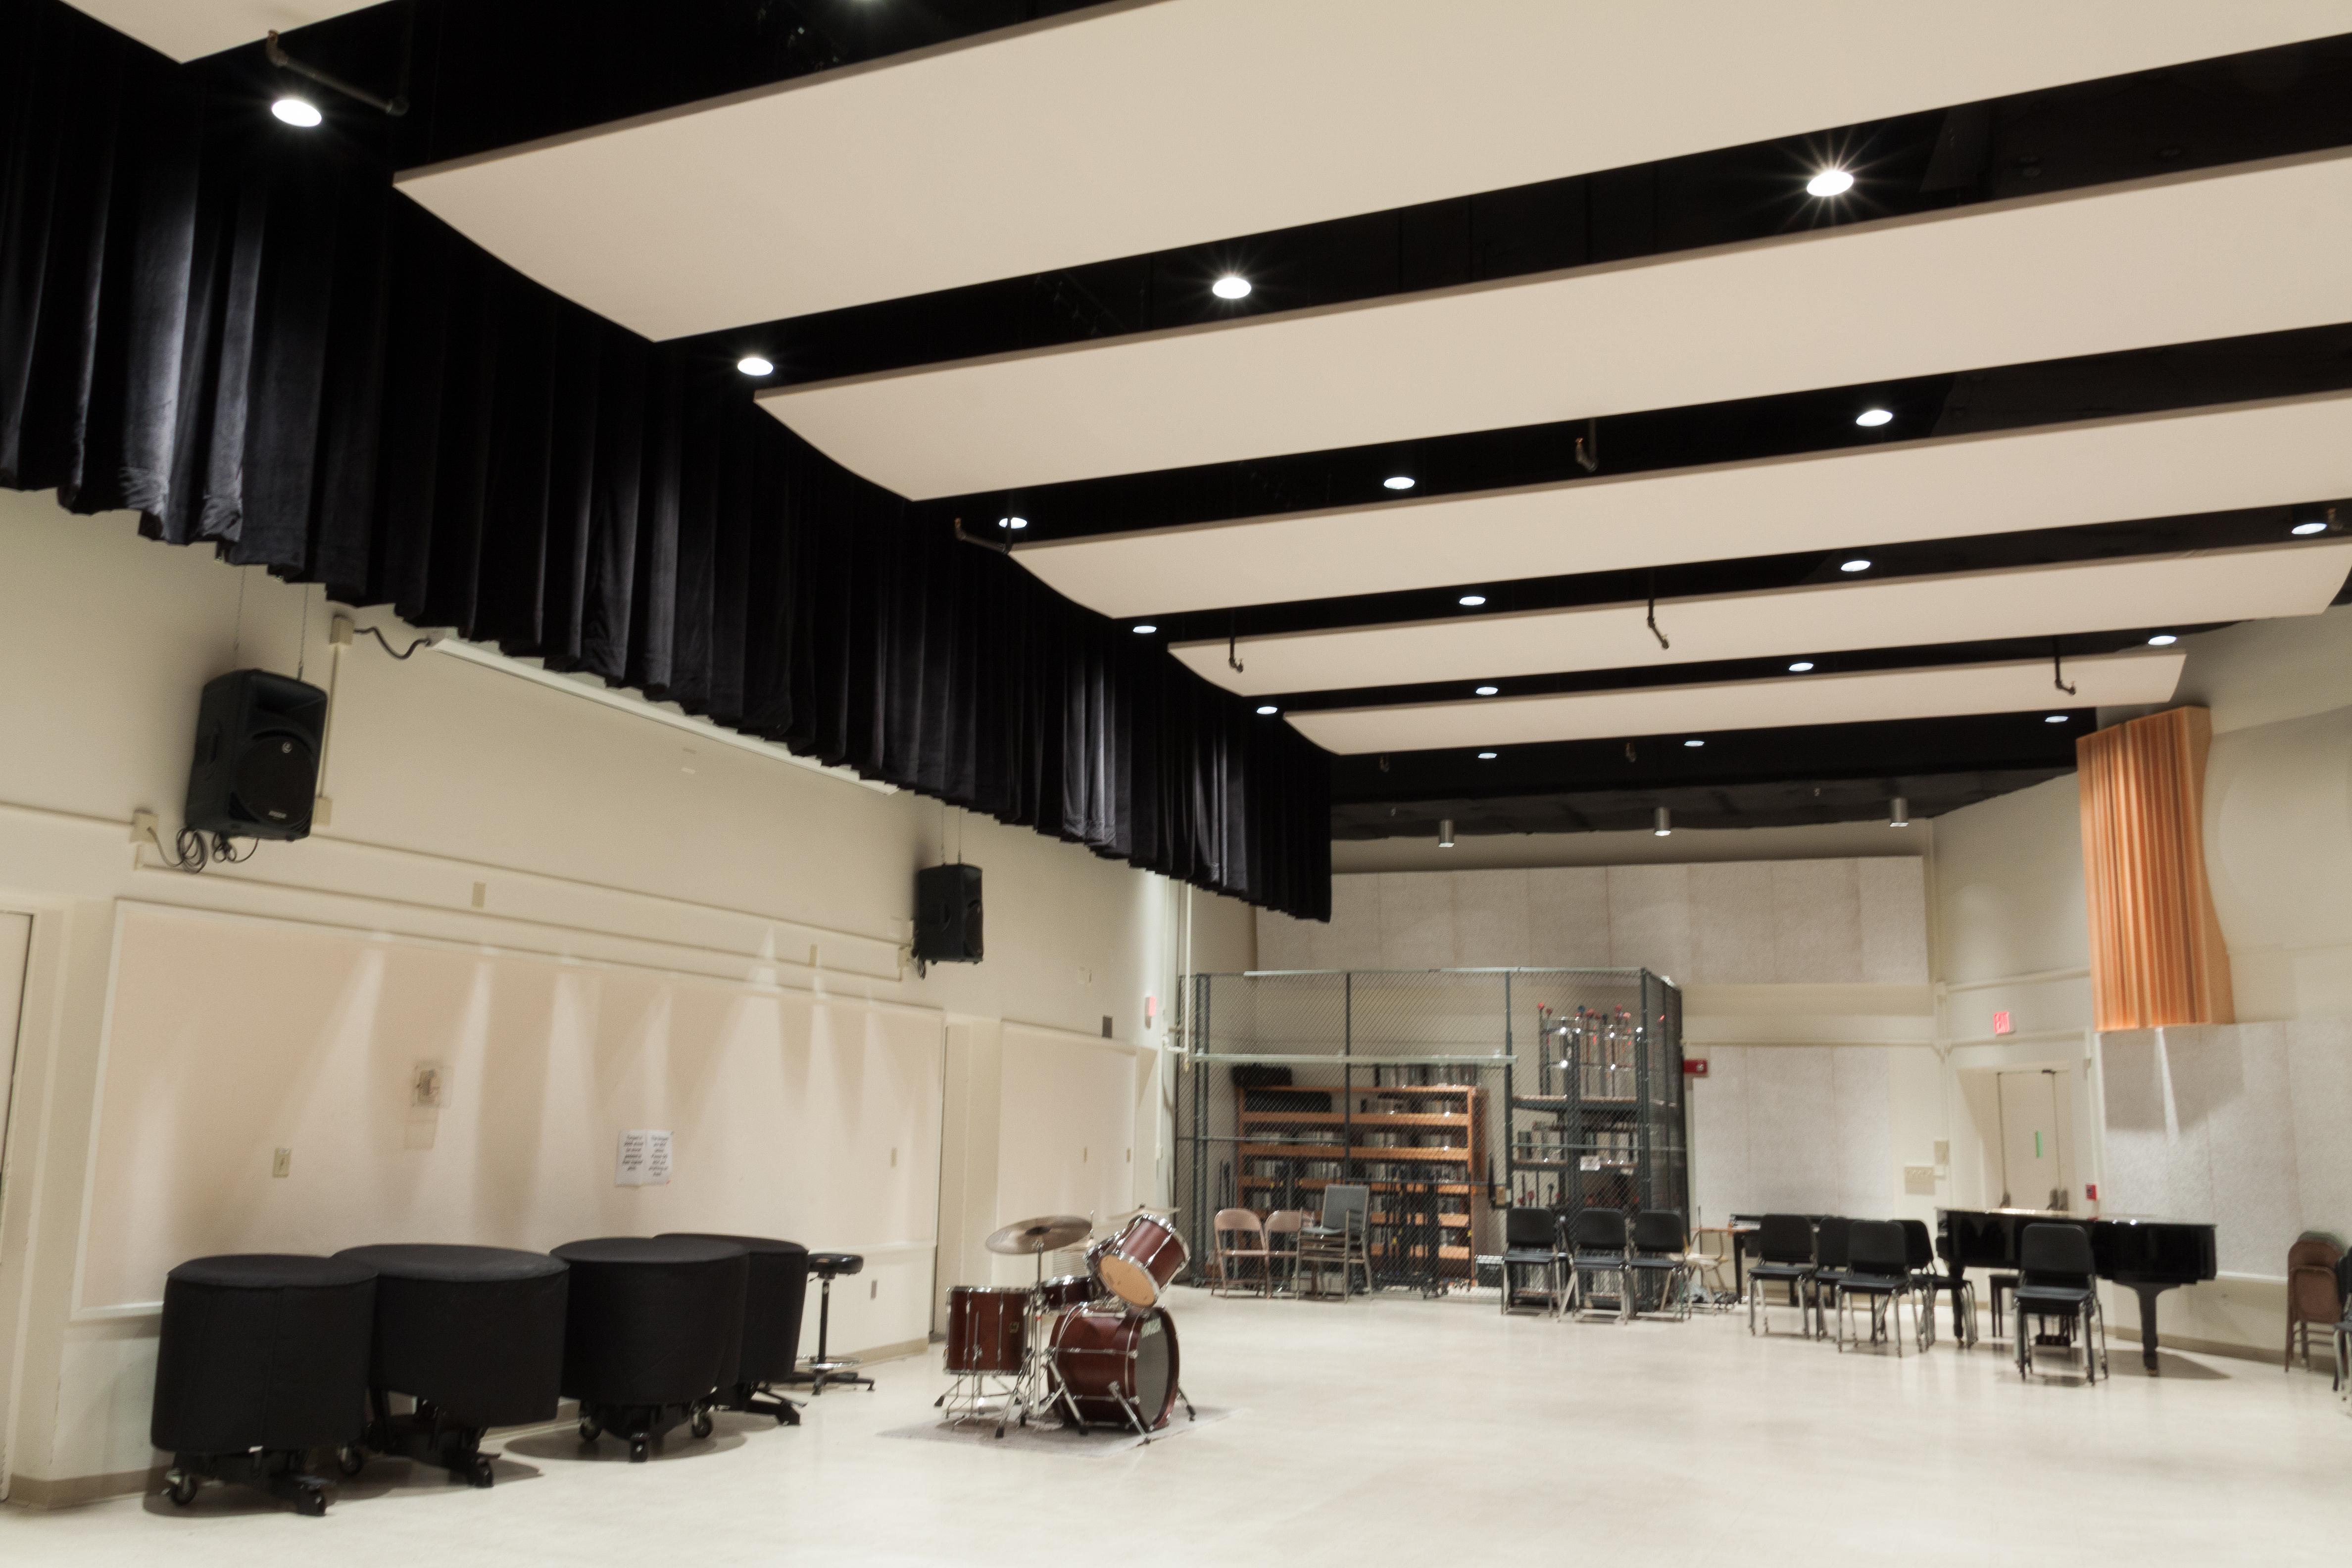 WVU CAC Rehearsal Hall 9-7-13-8